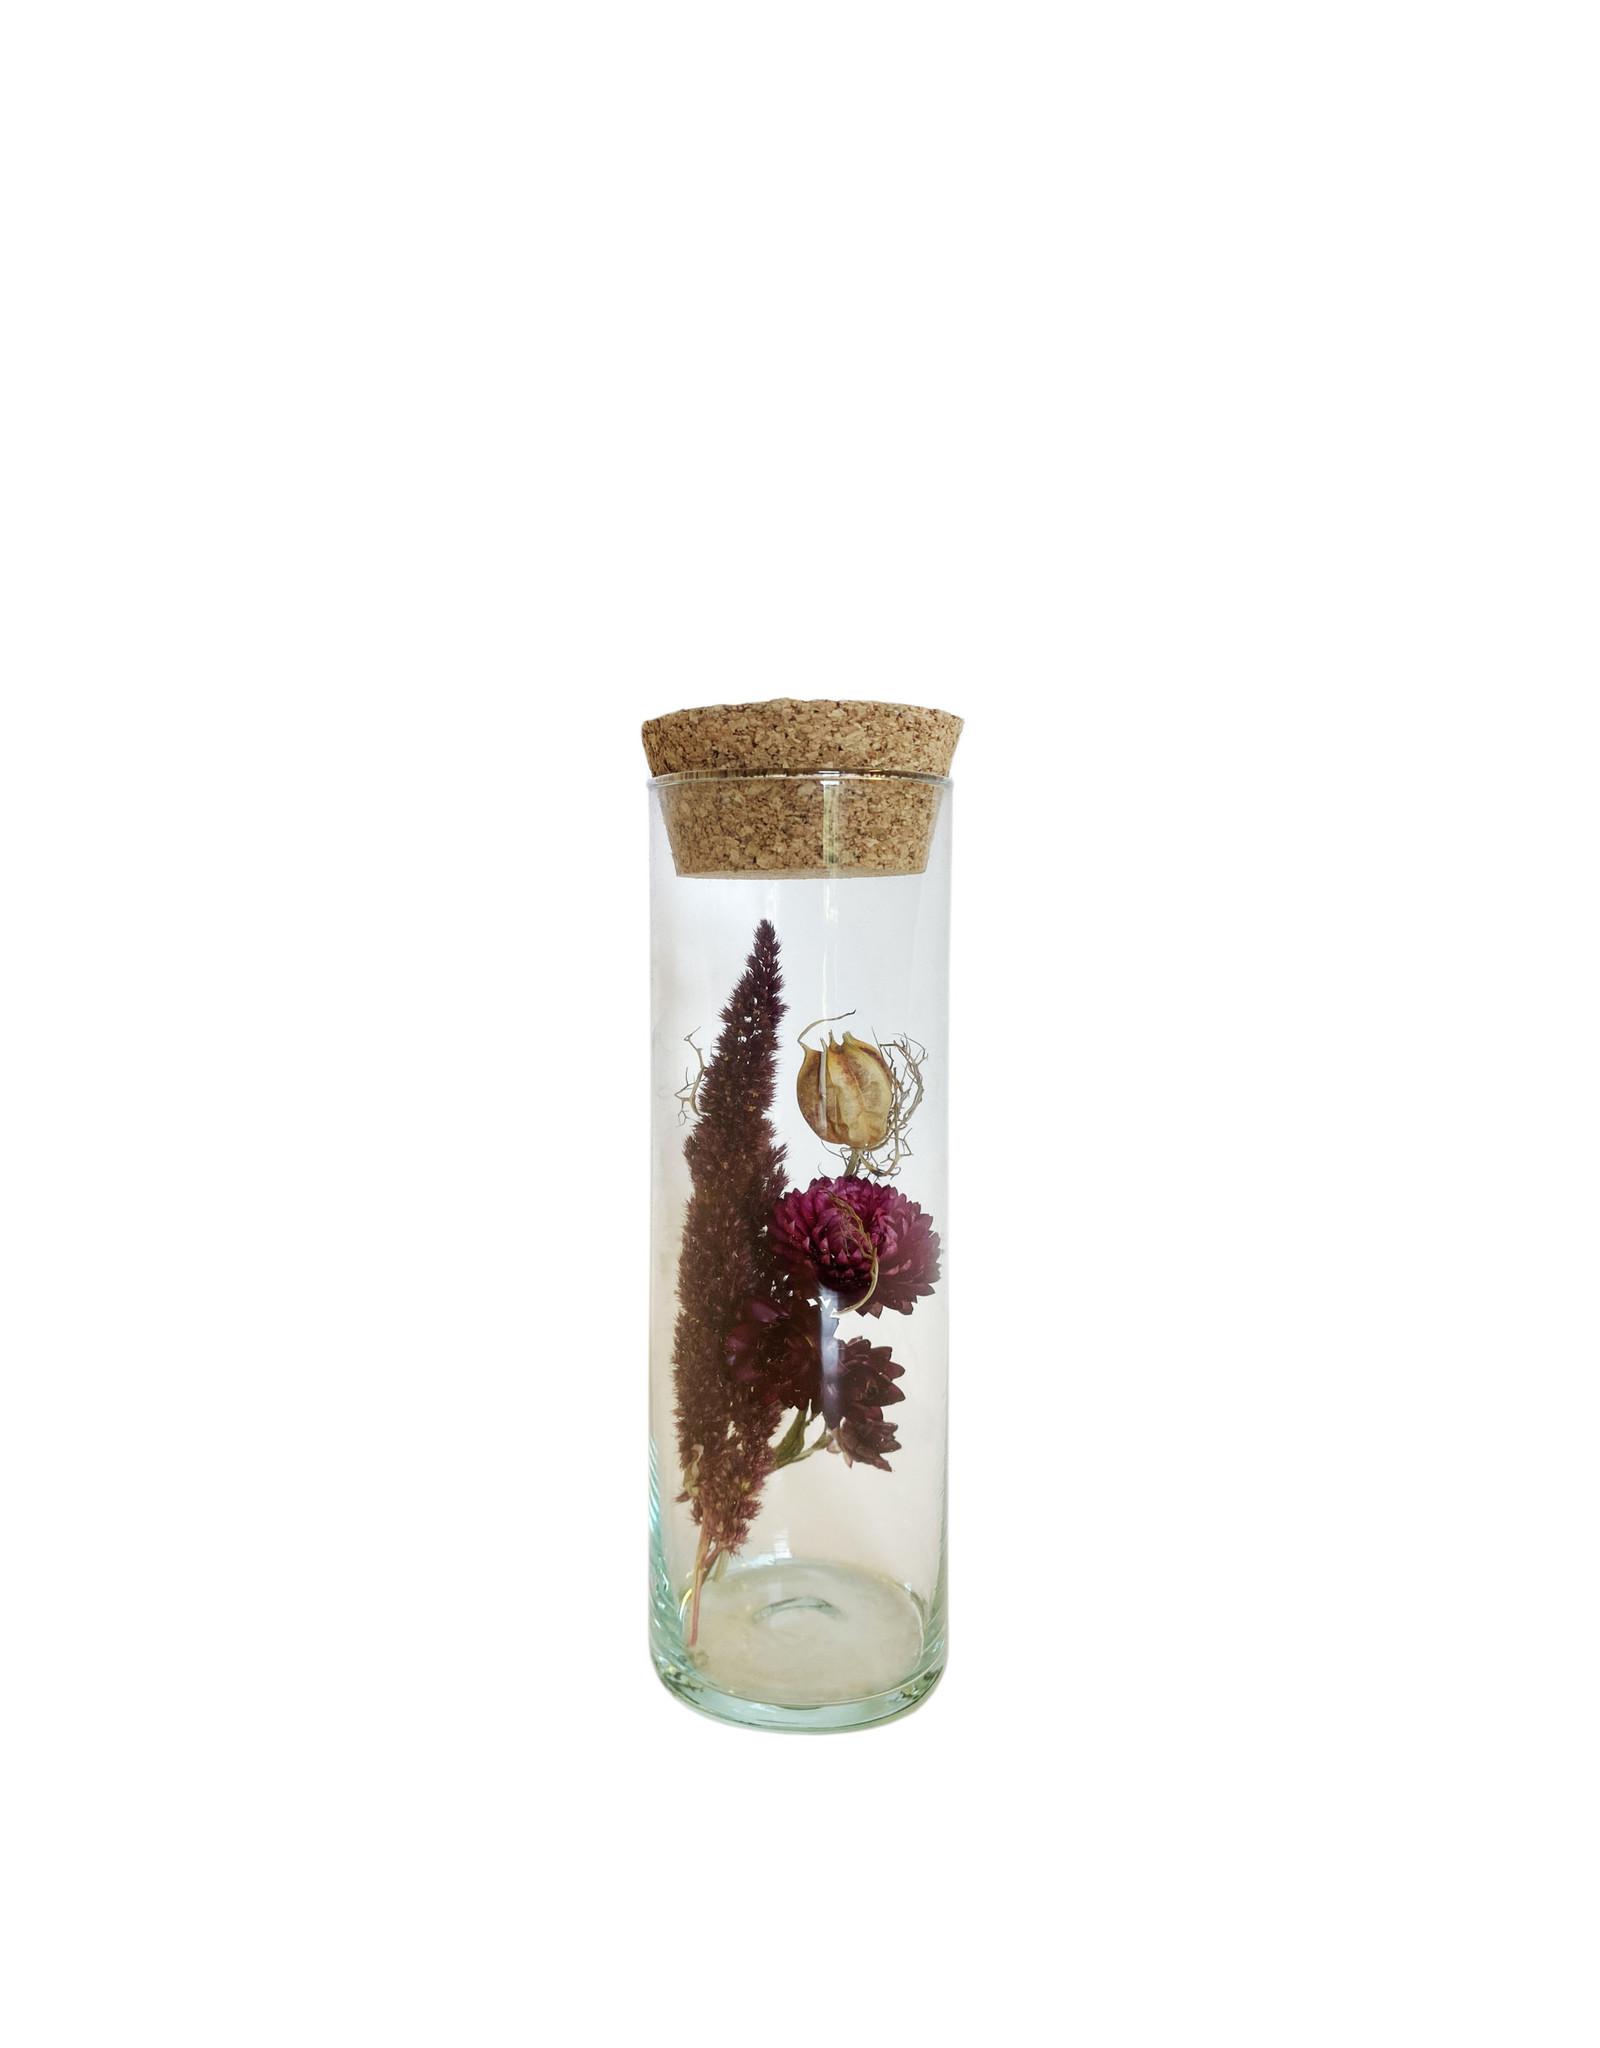 Droogbloemen cilinder breed rood roze 20cm